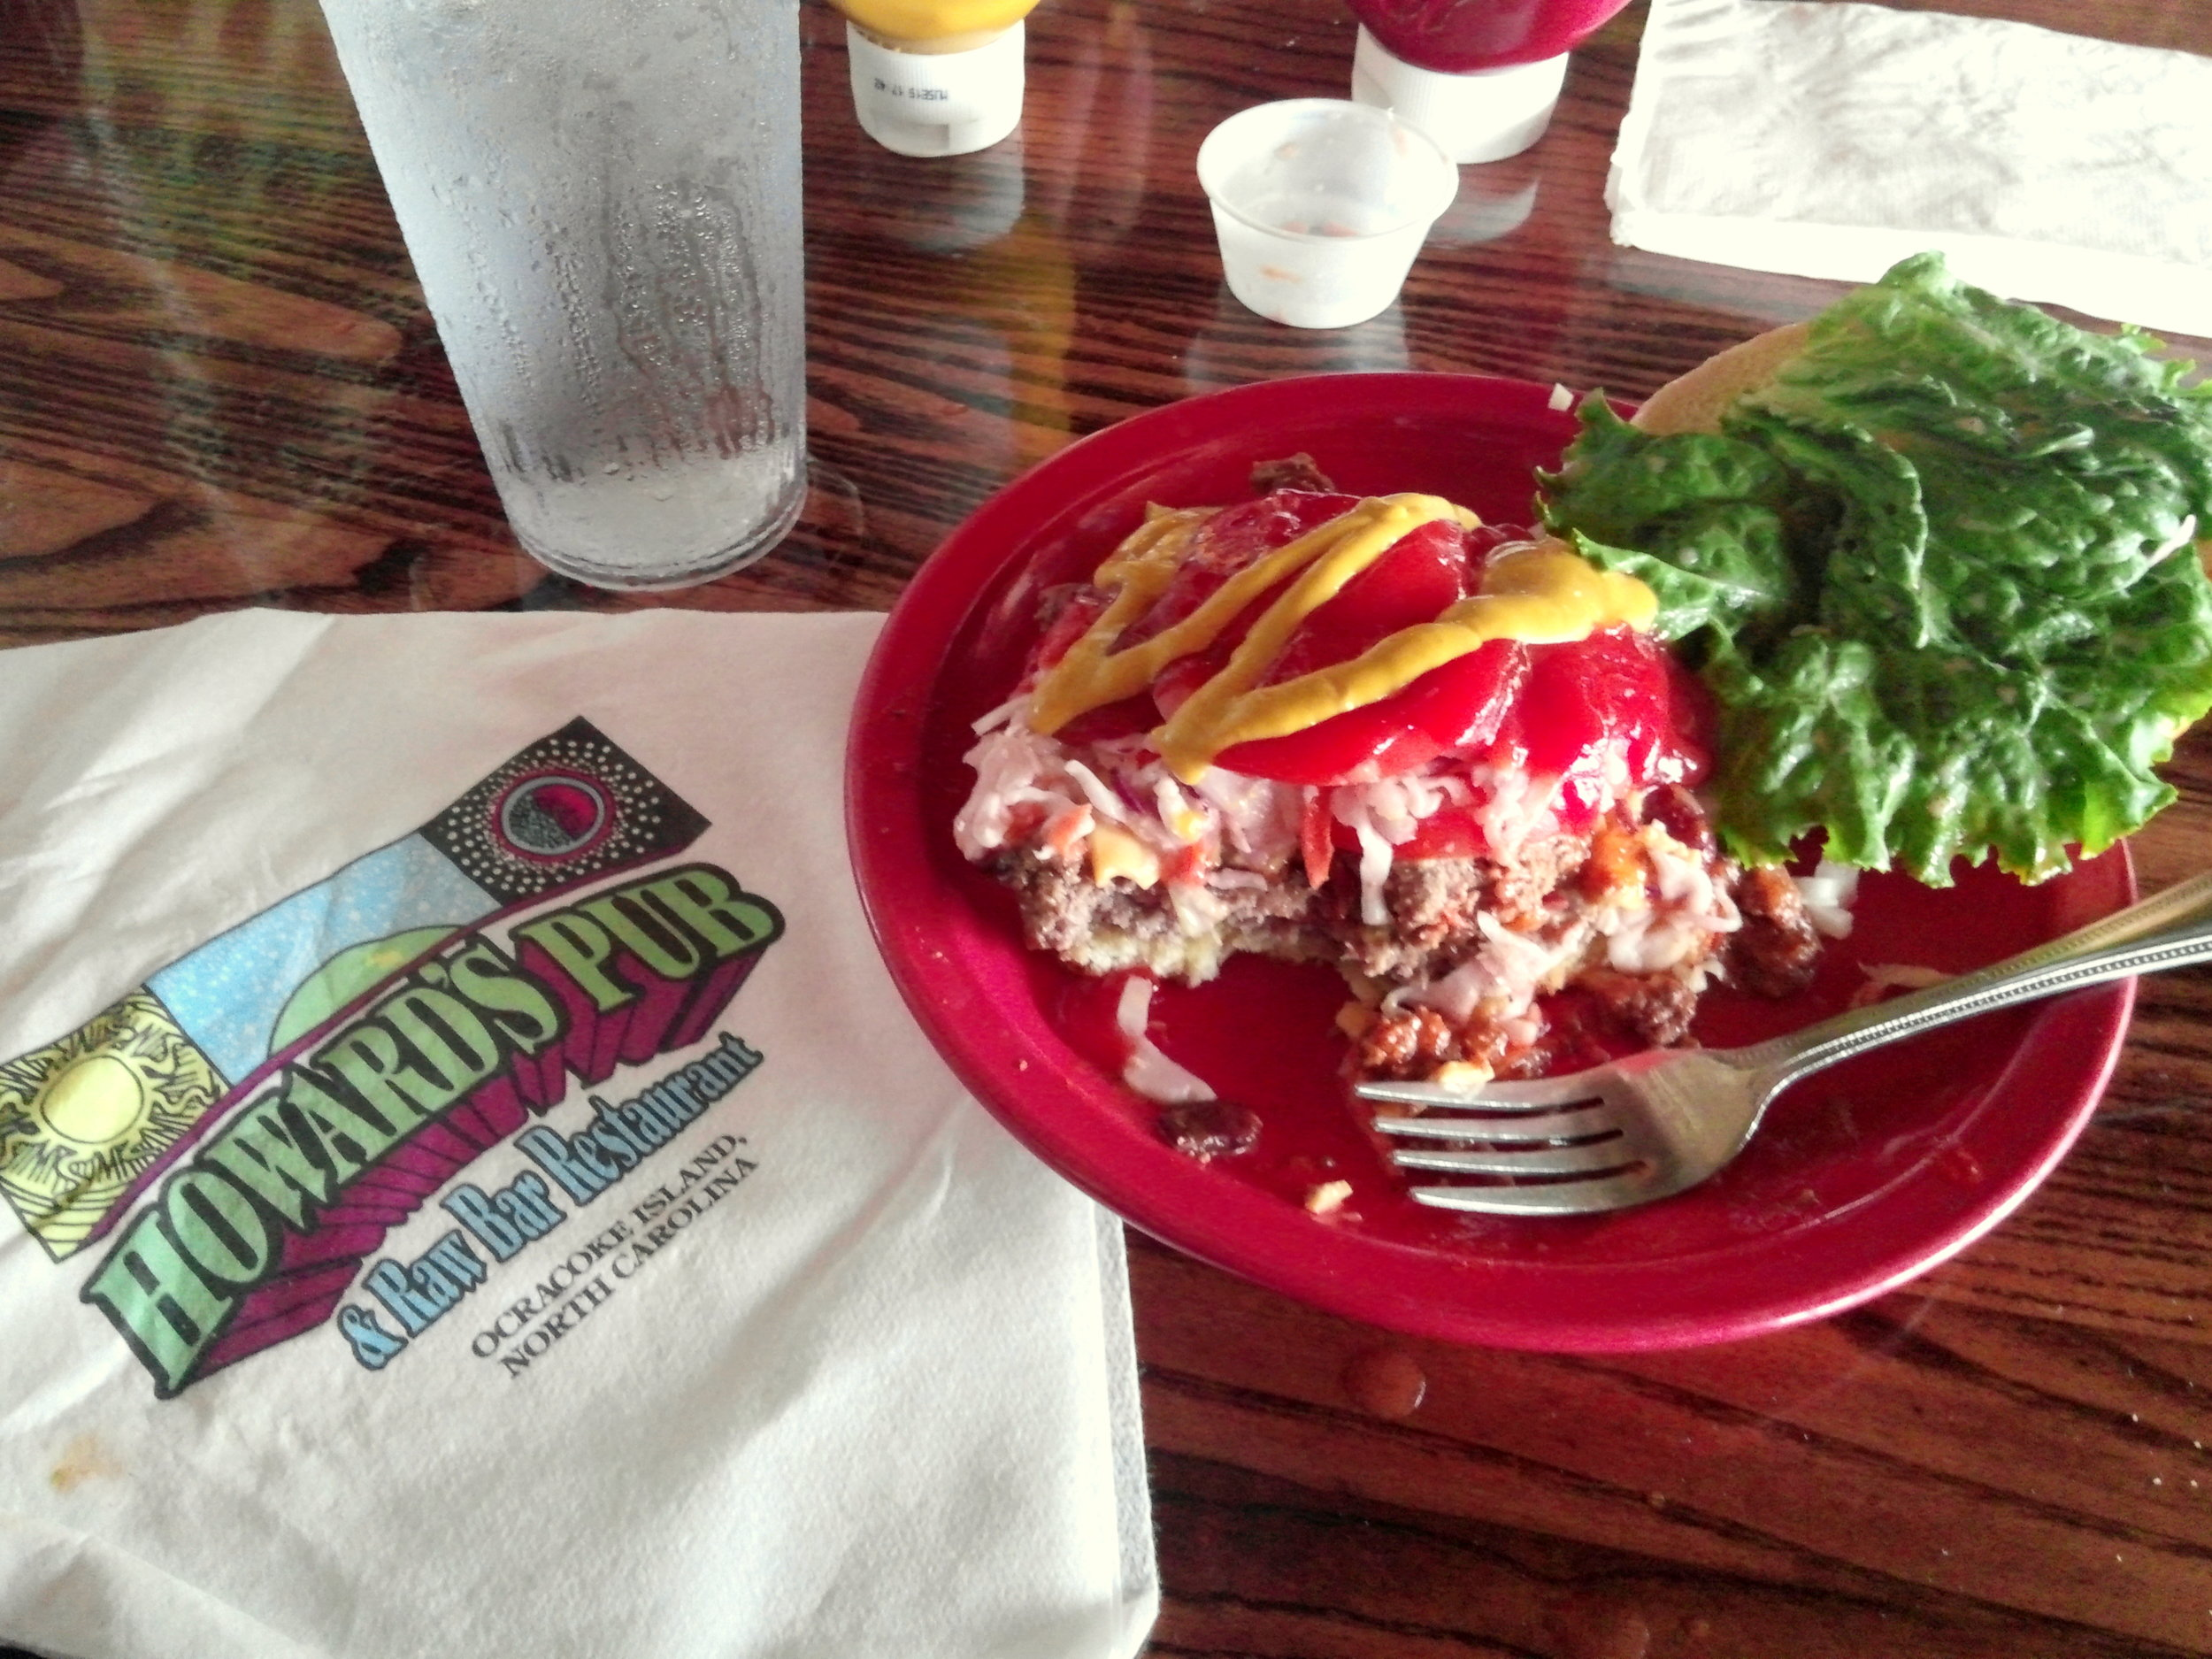 Burger from Howard's Pub on Ocracoke Island